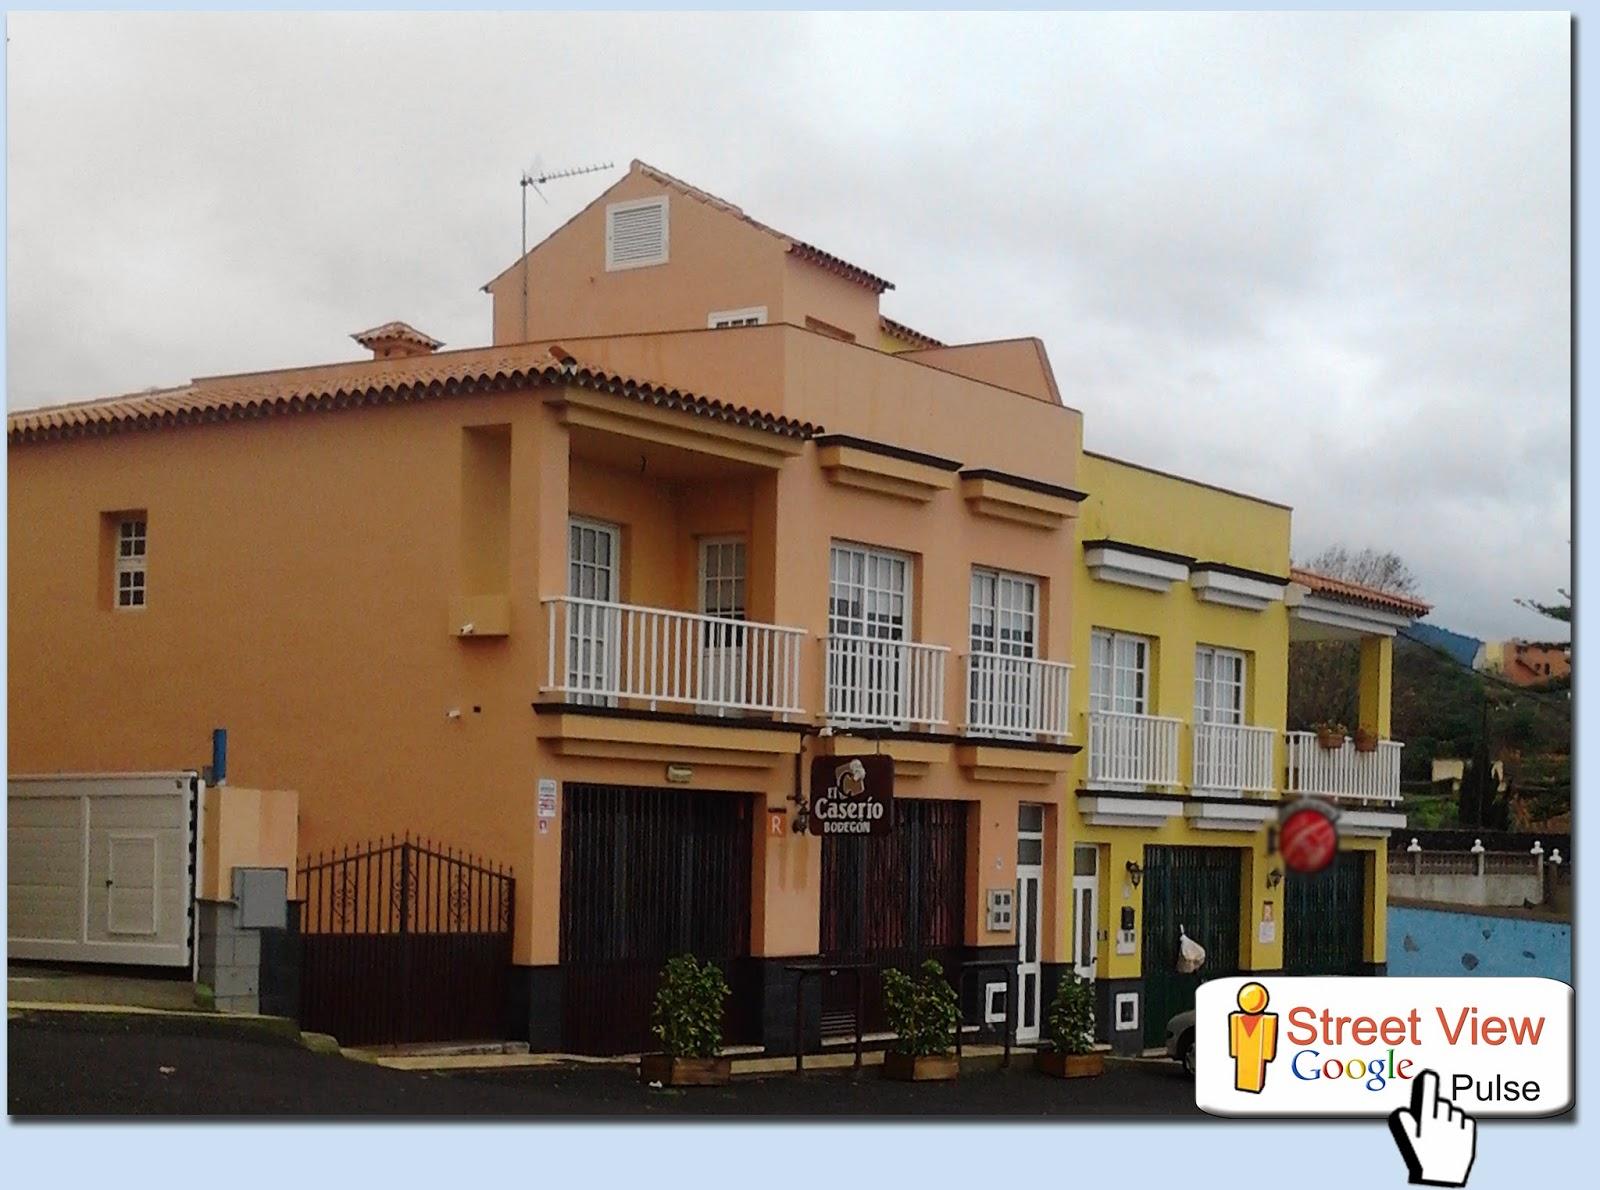 https://maps.google.es/maps?q=Lugar+la+Haza,+38300+La+Orotava,+Santa+Cruz+de+Tenerife,+Islas+Canarias&hl=es&ll=28.378705,-16.541108&spn=0.007722,0.009645&sll=28.378696,-16.541097&sspn=0.006863,0.009645&geocode=FTMNsQEd45AD_w&hnear=Lugar+la+Haza,+38300+La+Orotava,+Santa+Cruz+de+Tenerife,+Islas+Canarias&t=m&layer=c&cbll=28.378664,-16.540943&panoid=f6RitnhONKy_PXtLA6nCSA&cbp=12,225.32,,0,6.9&z=17